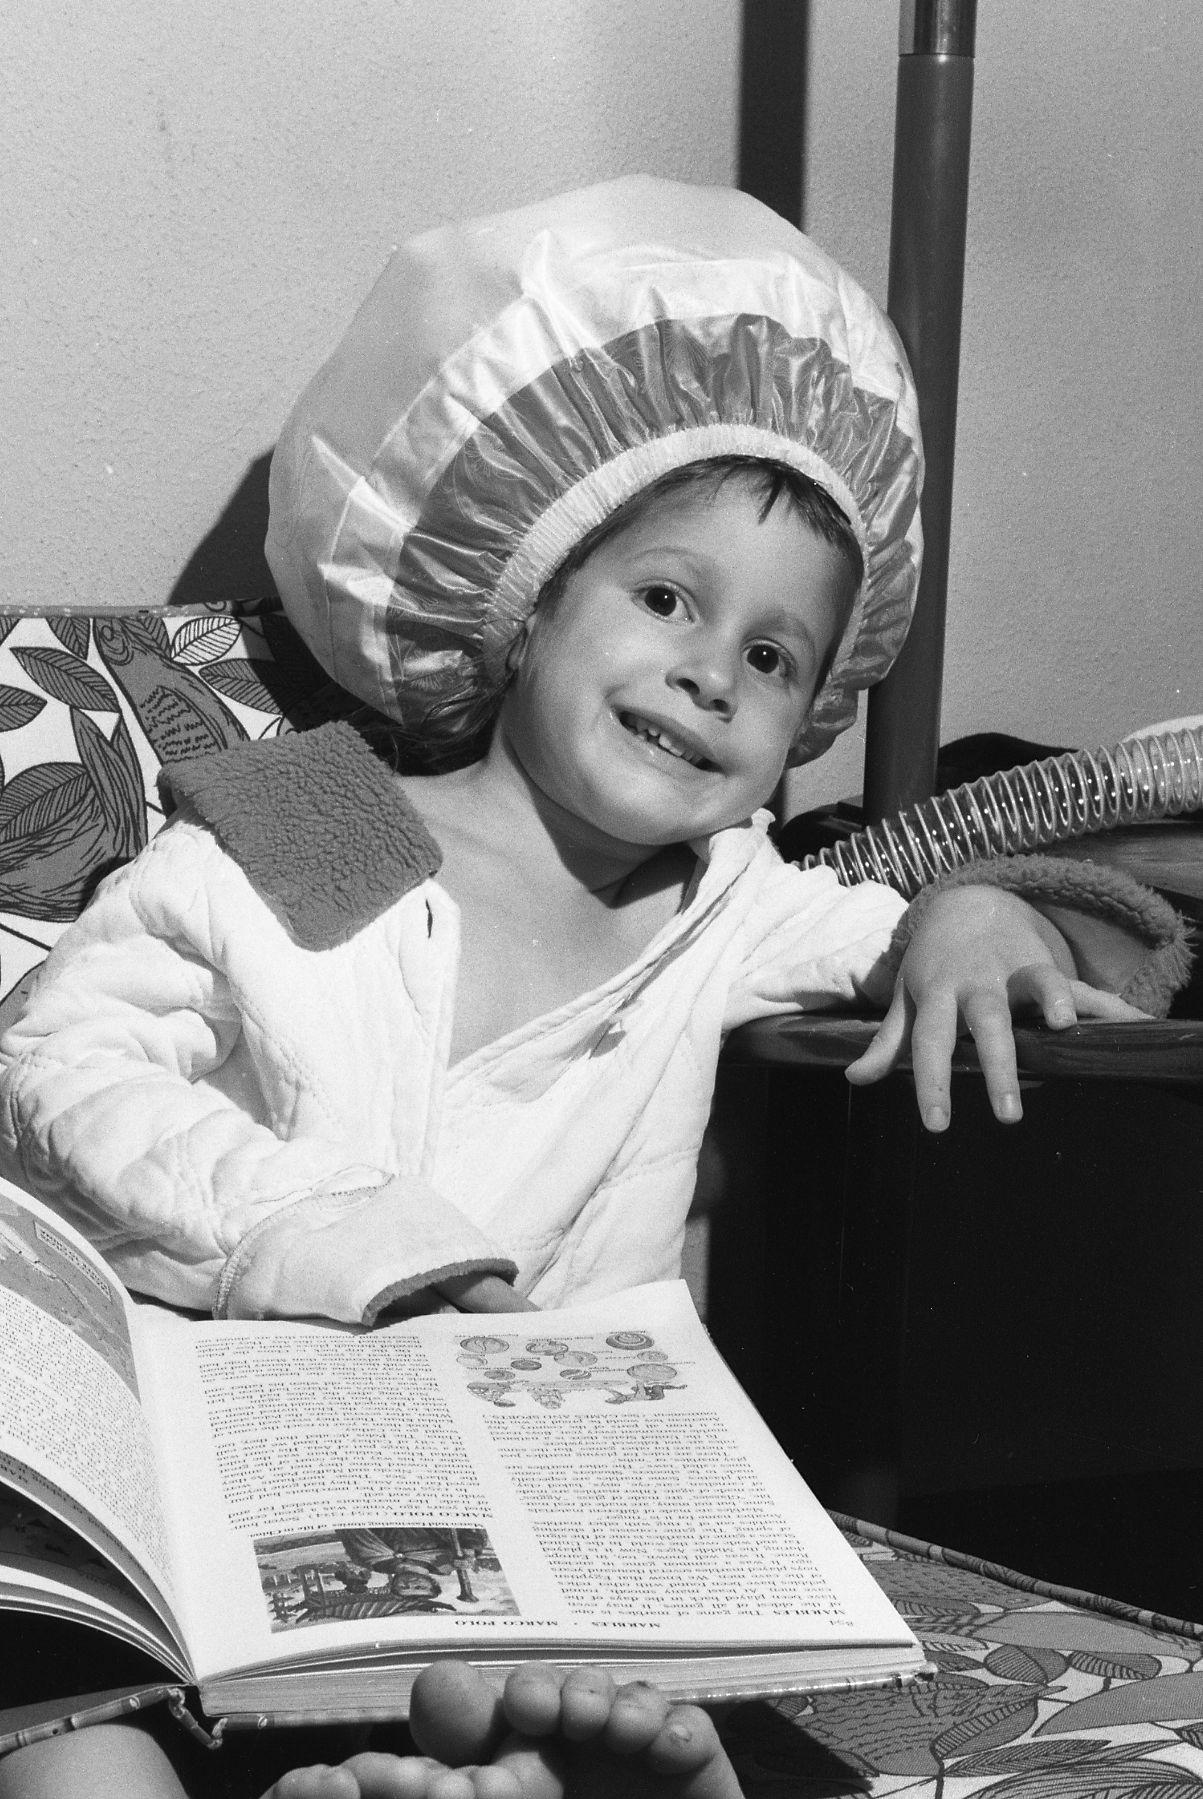 FileBonnet Hood Hair Dryer 1965